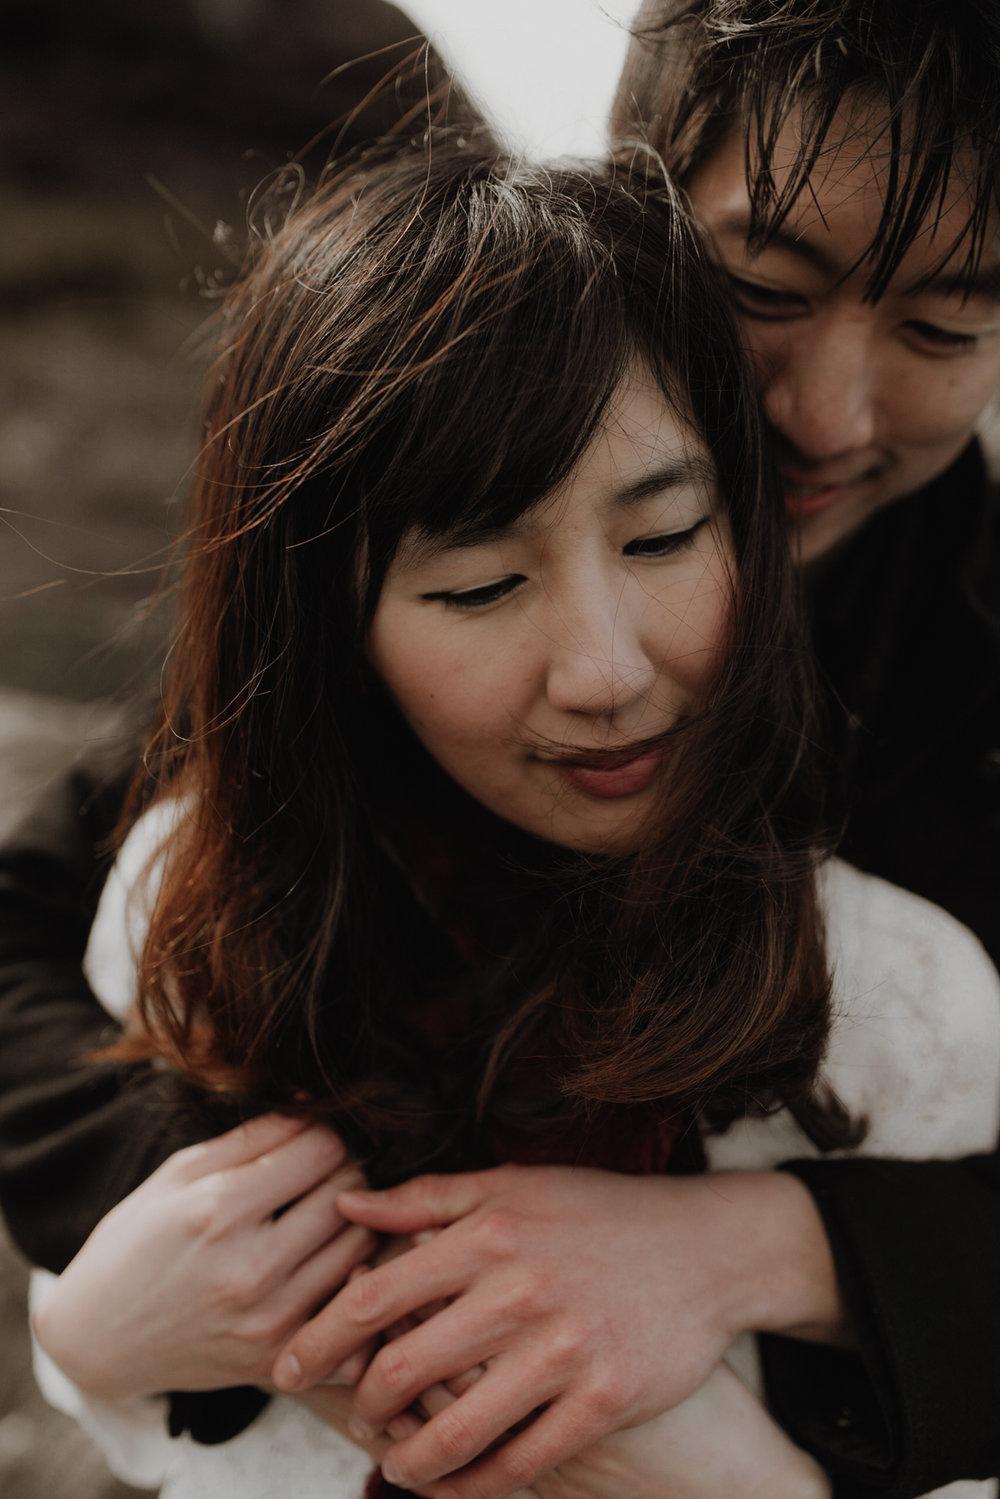 seattle-wedding-photographer-kerouac-0401.jpg